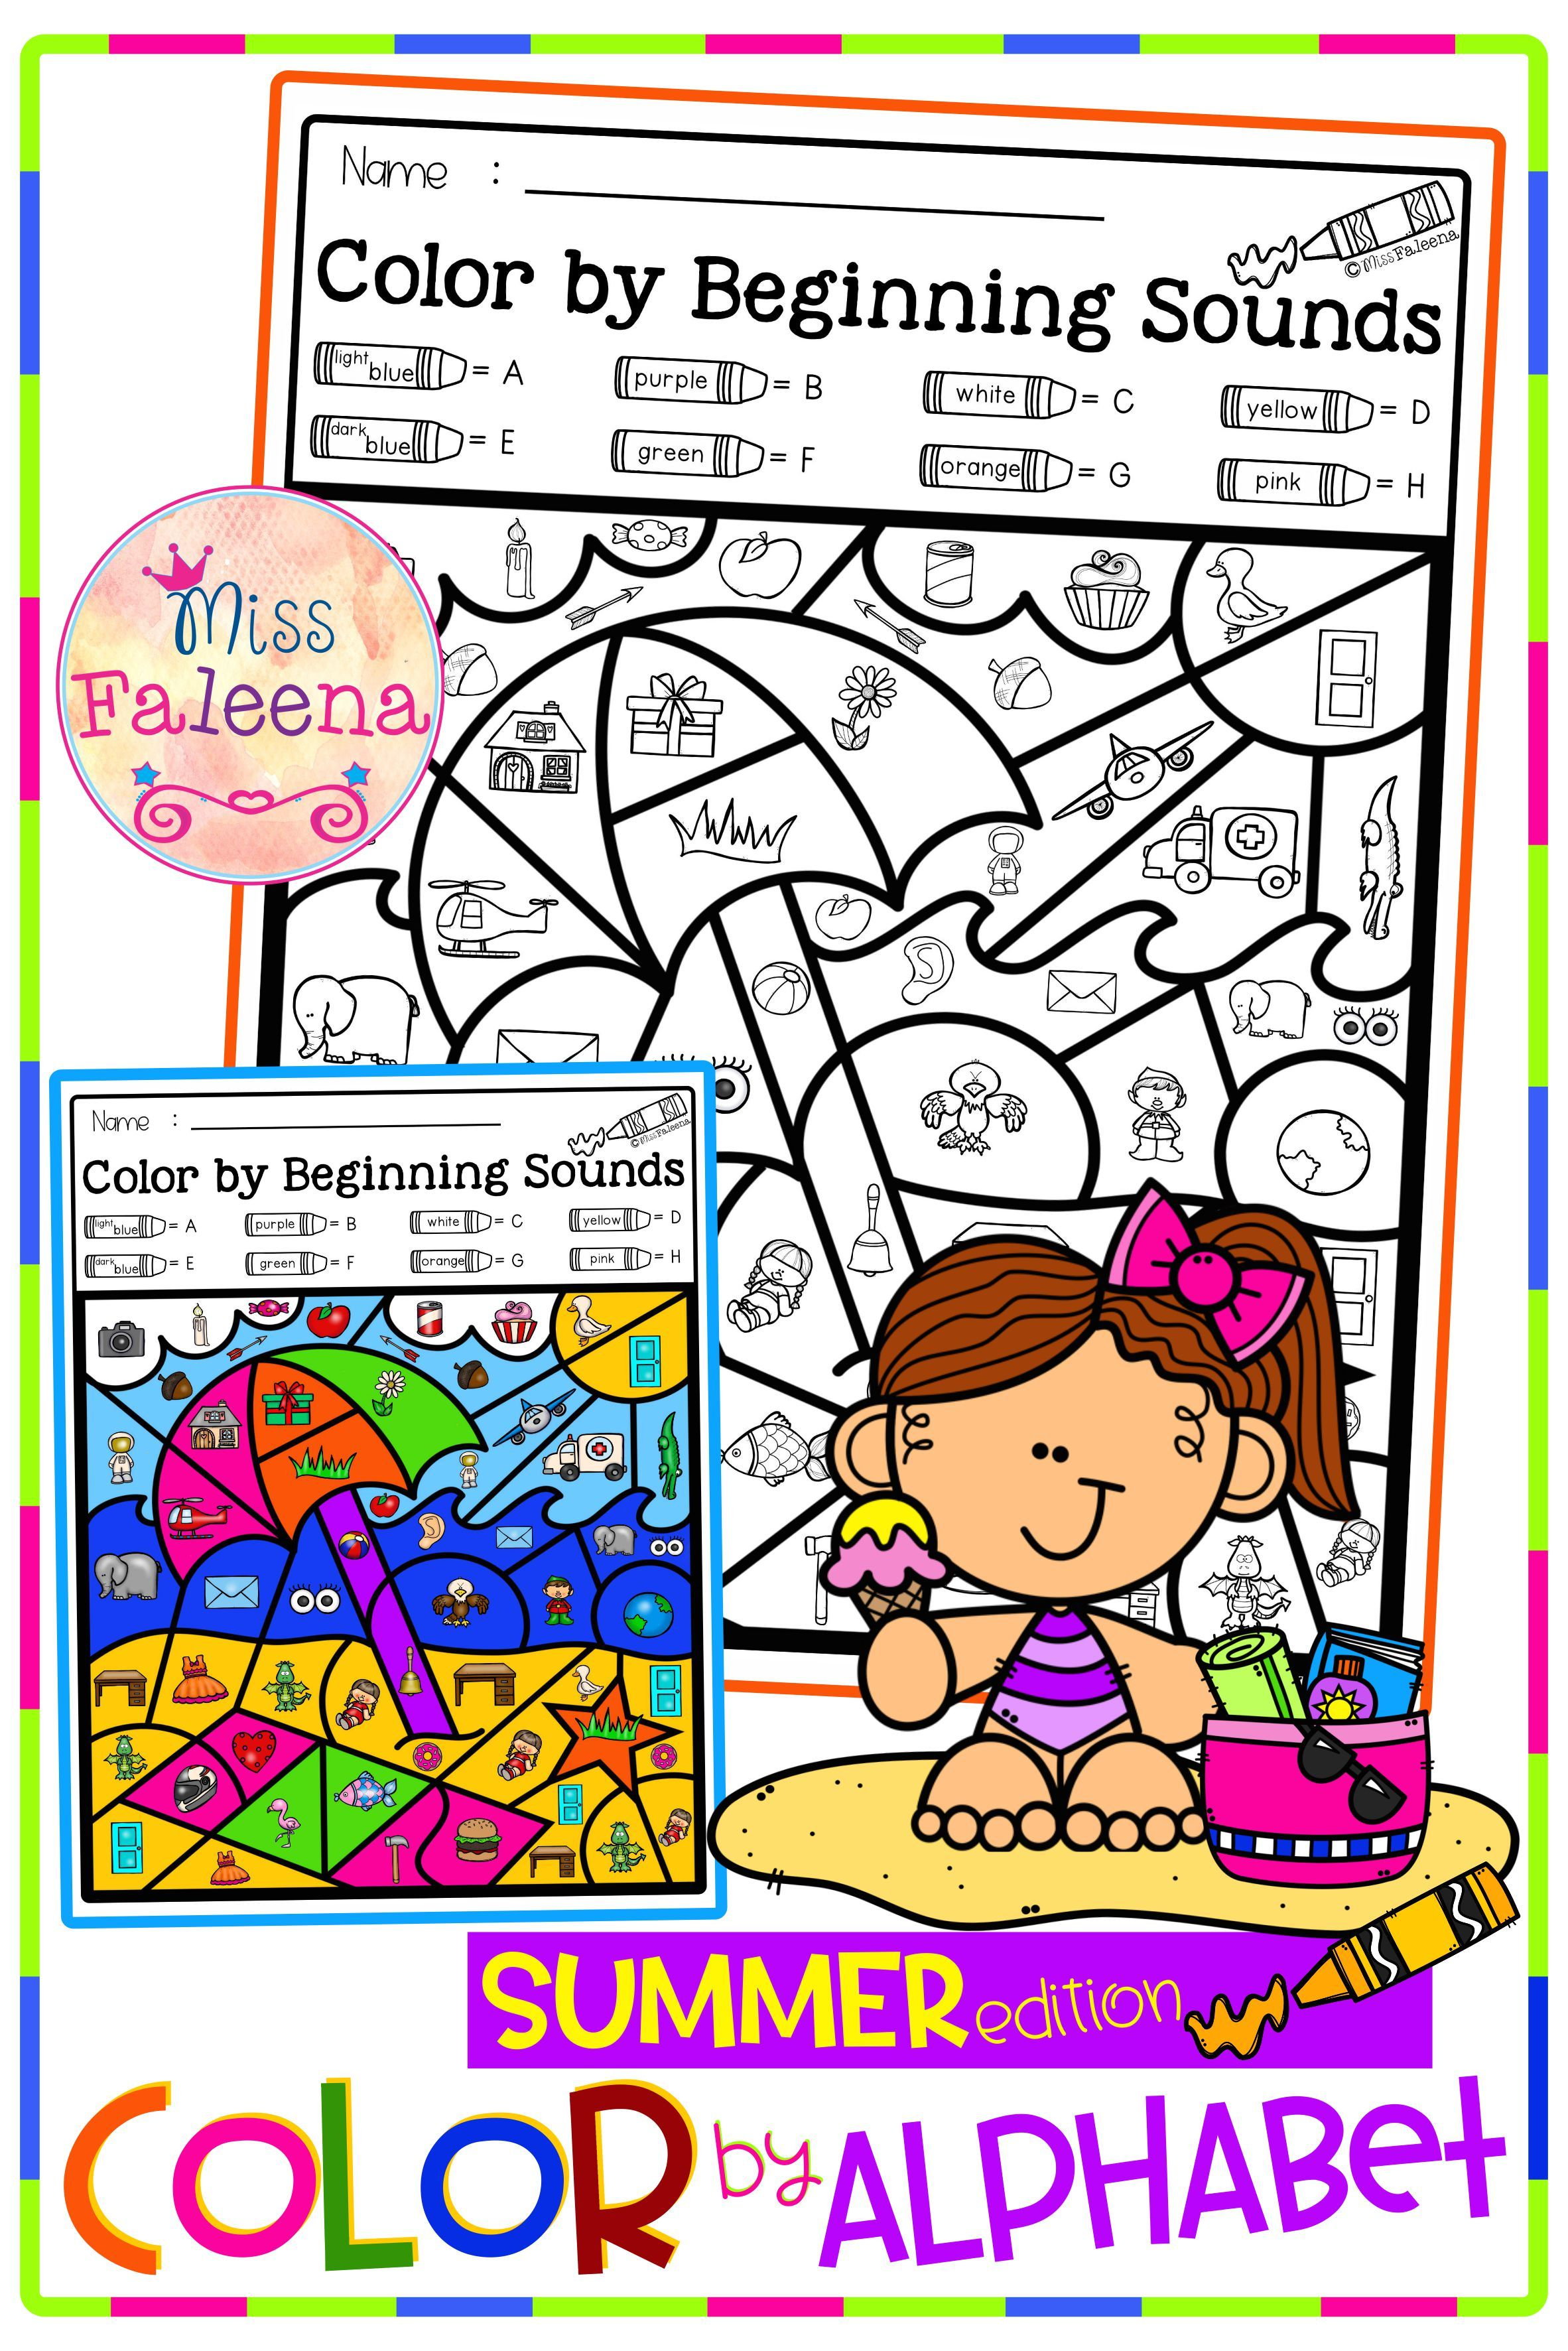 Summer Color By Code Alphabet Abc Phonics Alphabet Teaching First Grade [ 3544 x 2364 Pixel ]